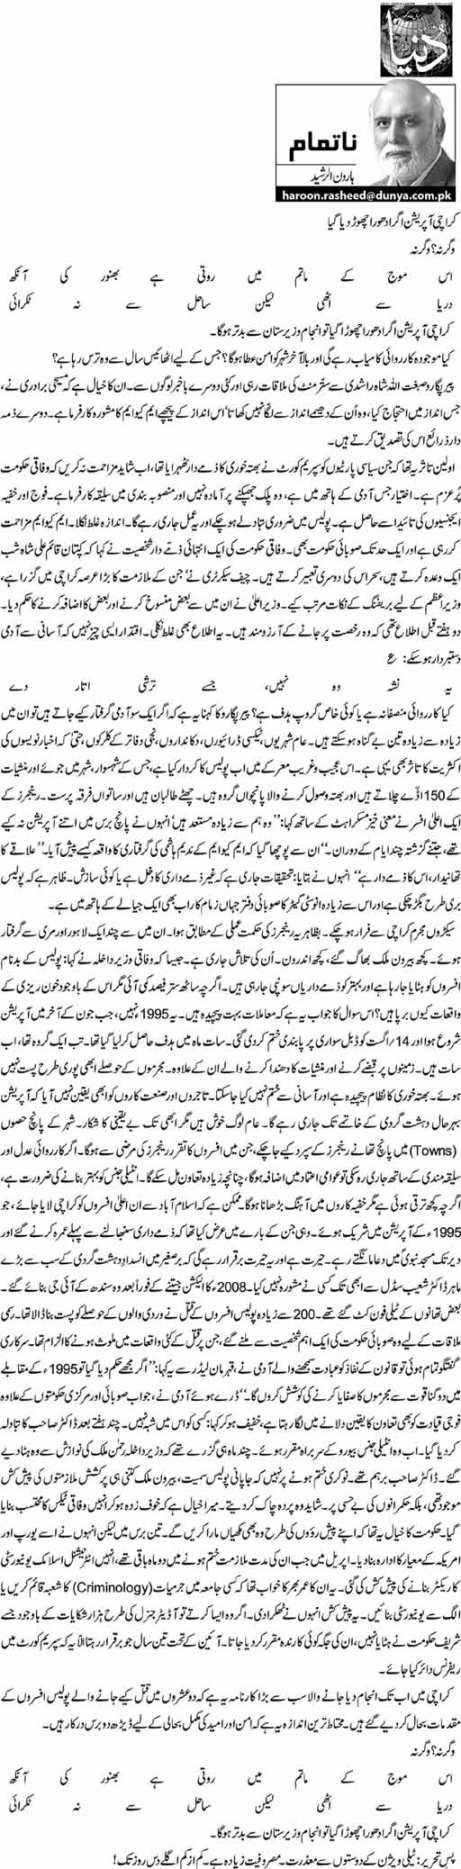 Karachi Operation Agar Adhoora Chor Dya Gya - Haroon ur Rasheed